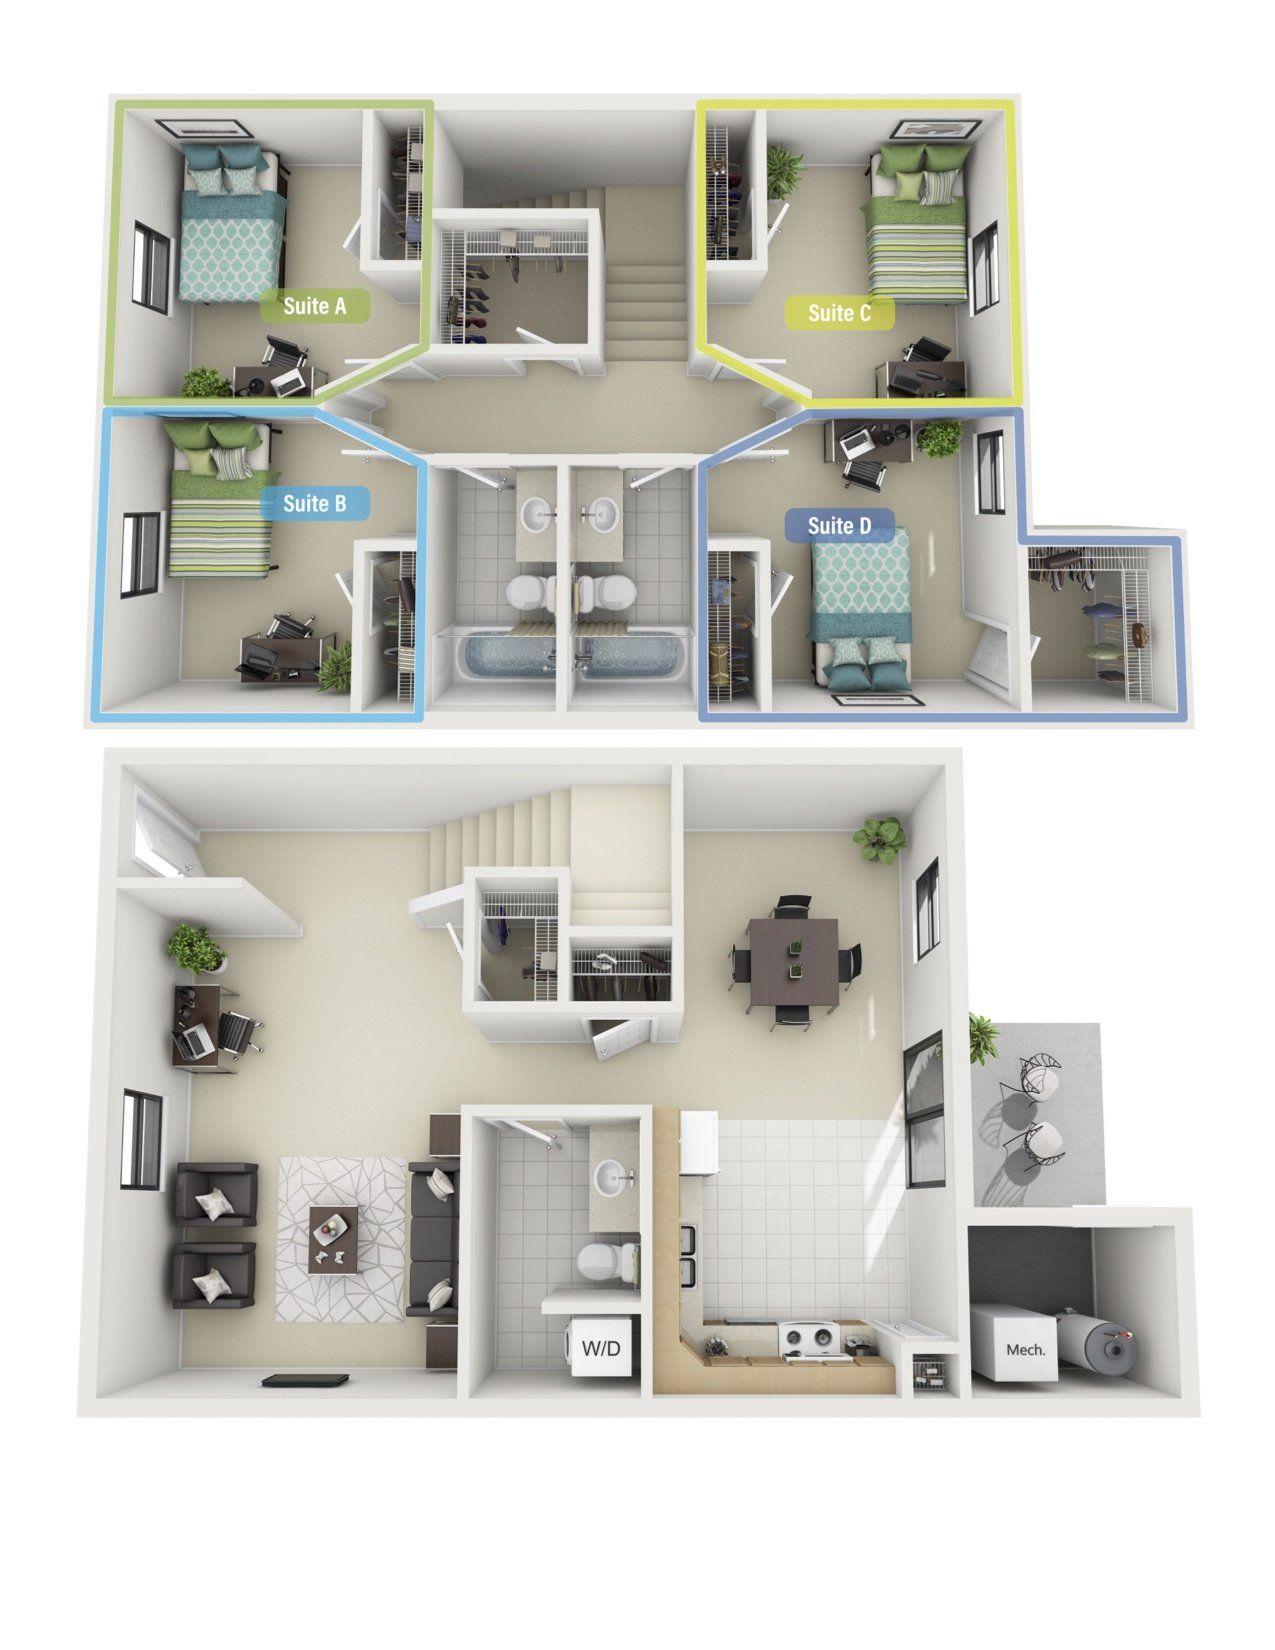 Campus Creek Cottages And Apartments Off Campus Housing Big Rapids Mi Forrentuniversity Com Campus Apartment Apartment House